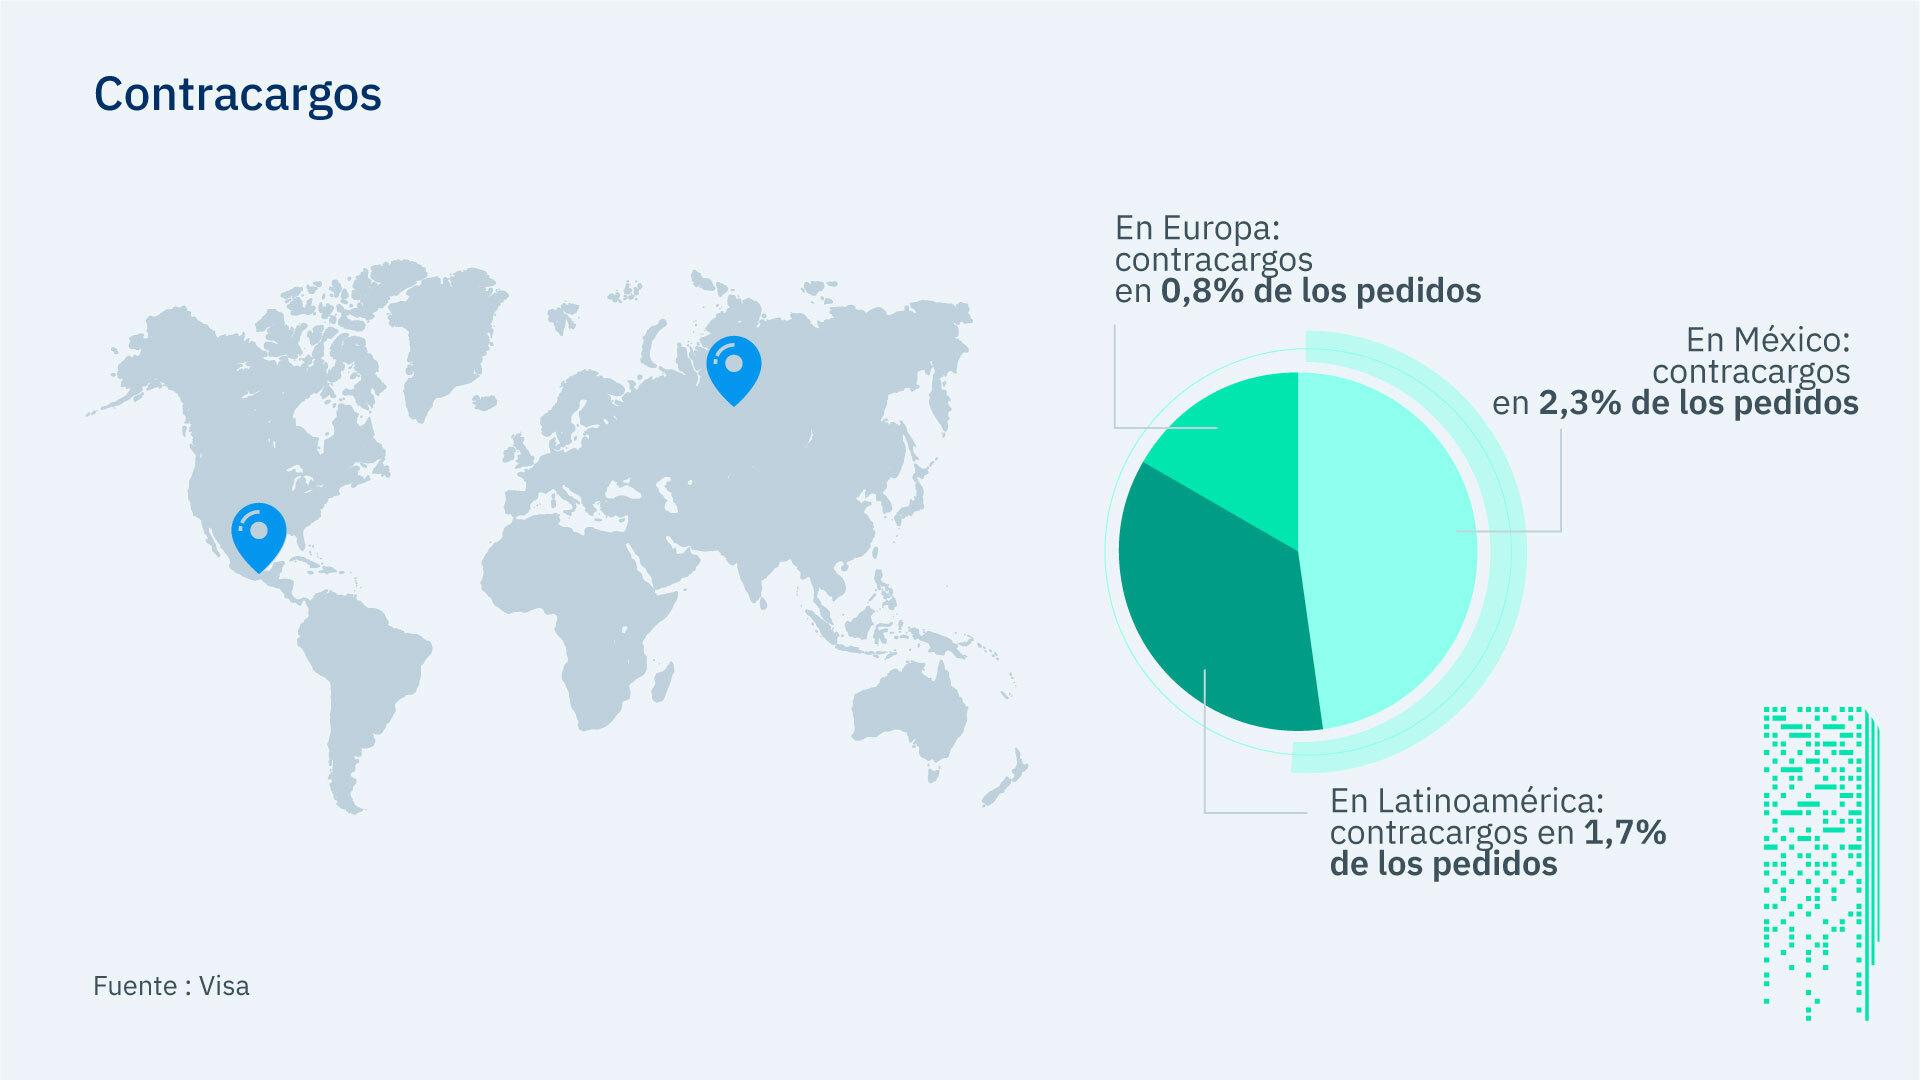 Contracargos a nivel mundial según Visa. Kushki